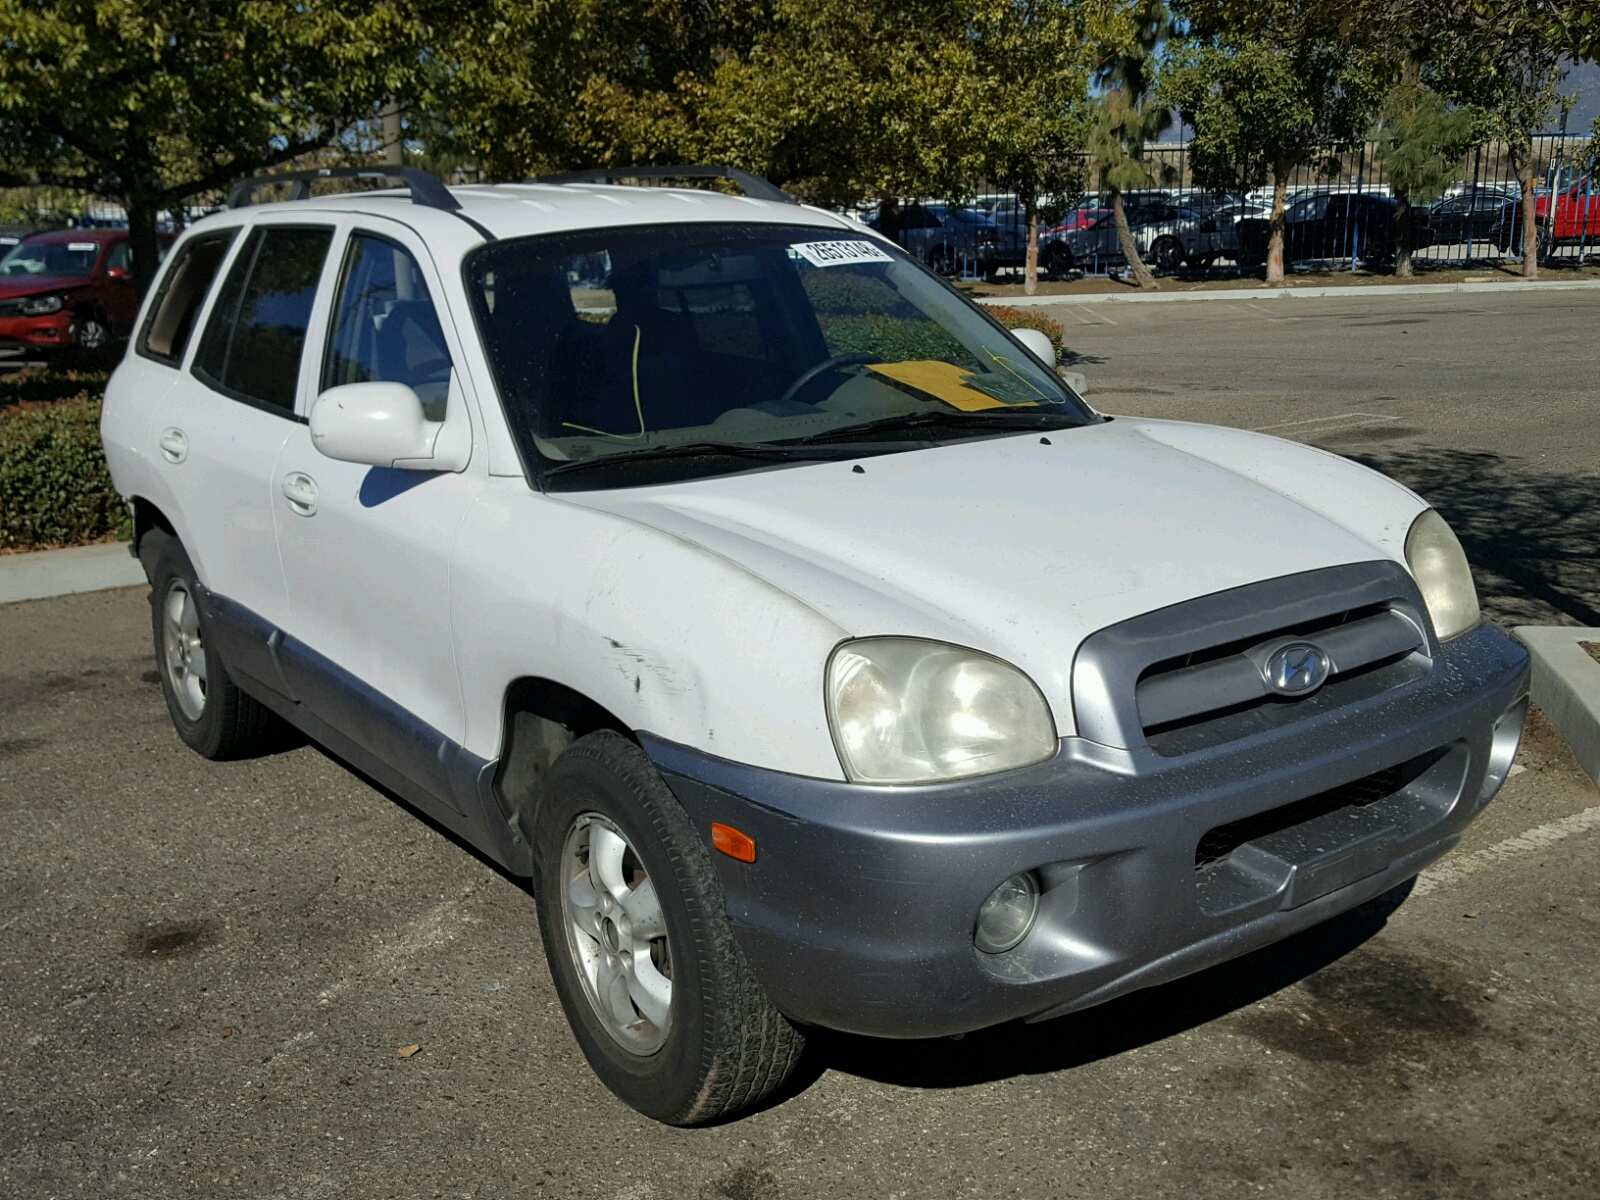 of black copart salvage sale online auto elantra se en hyundai on title sc auctions greer in lot carfinder cert